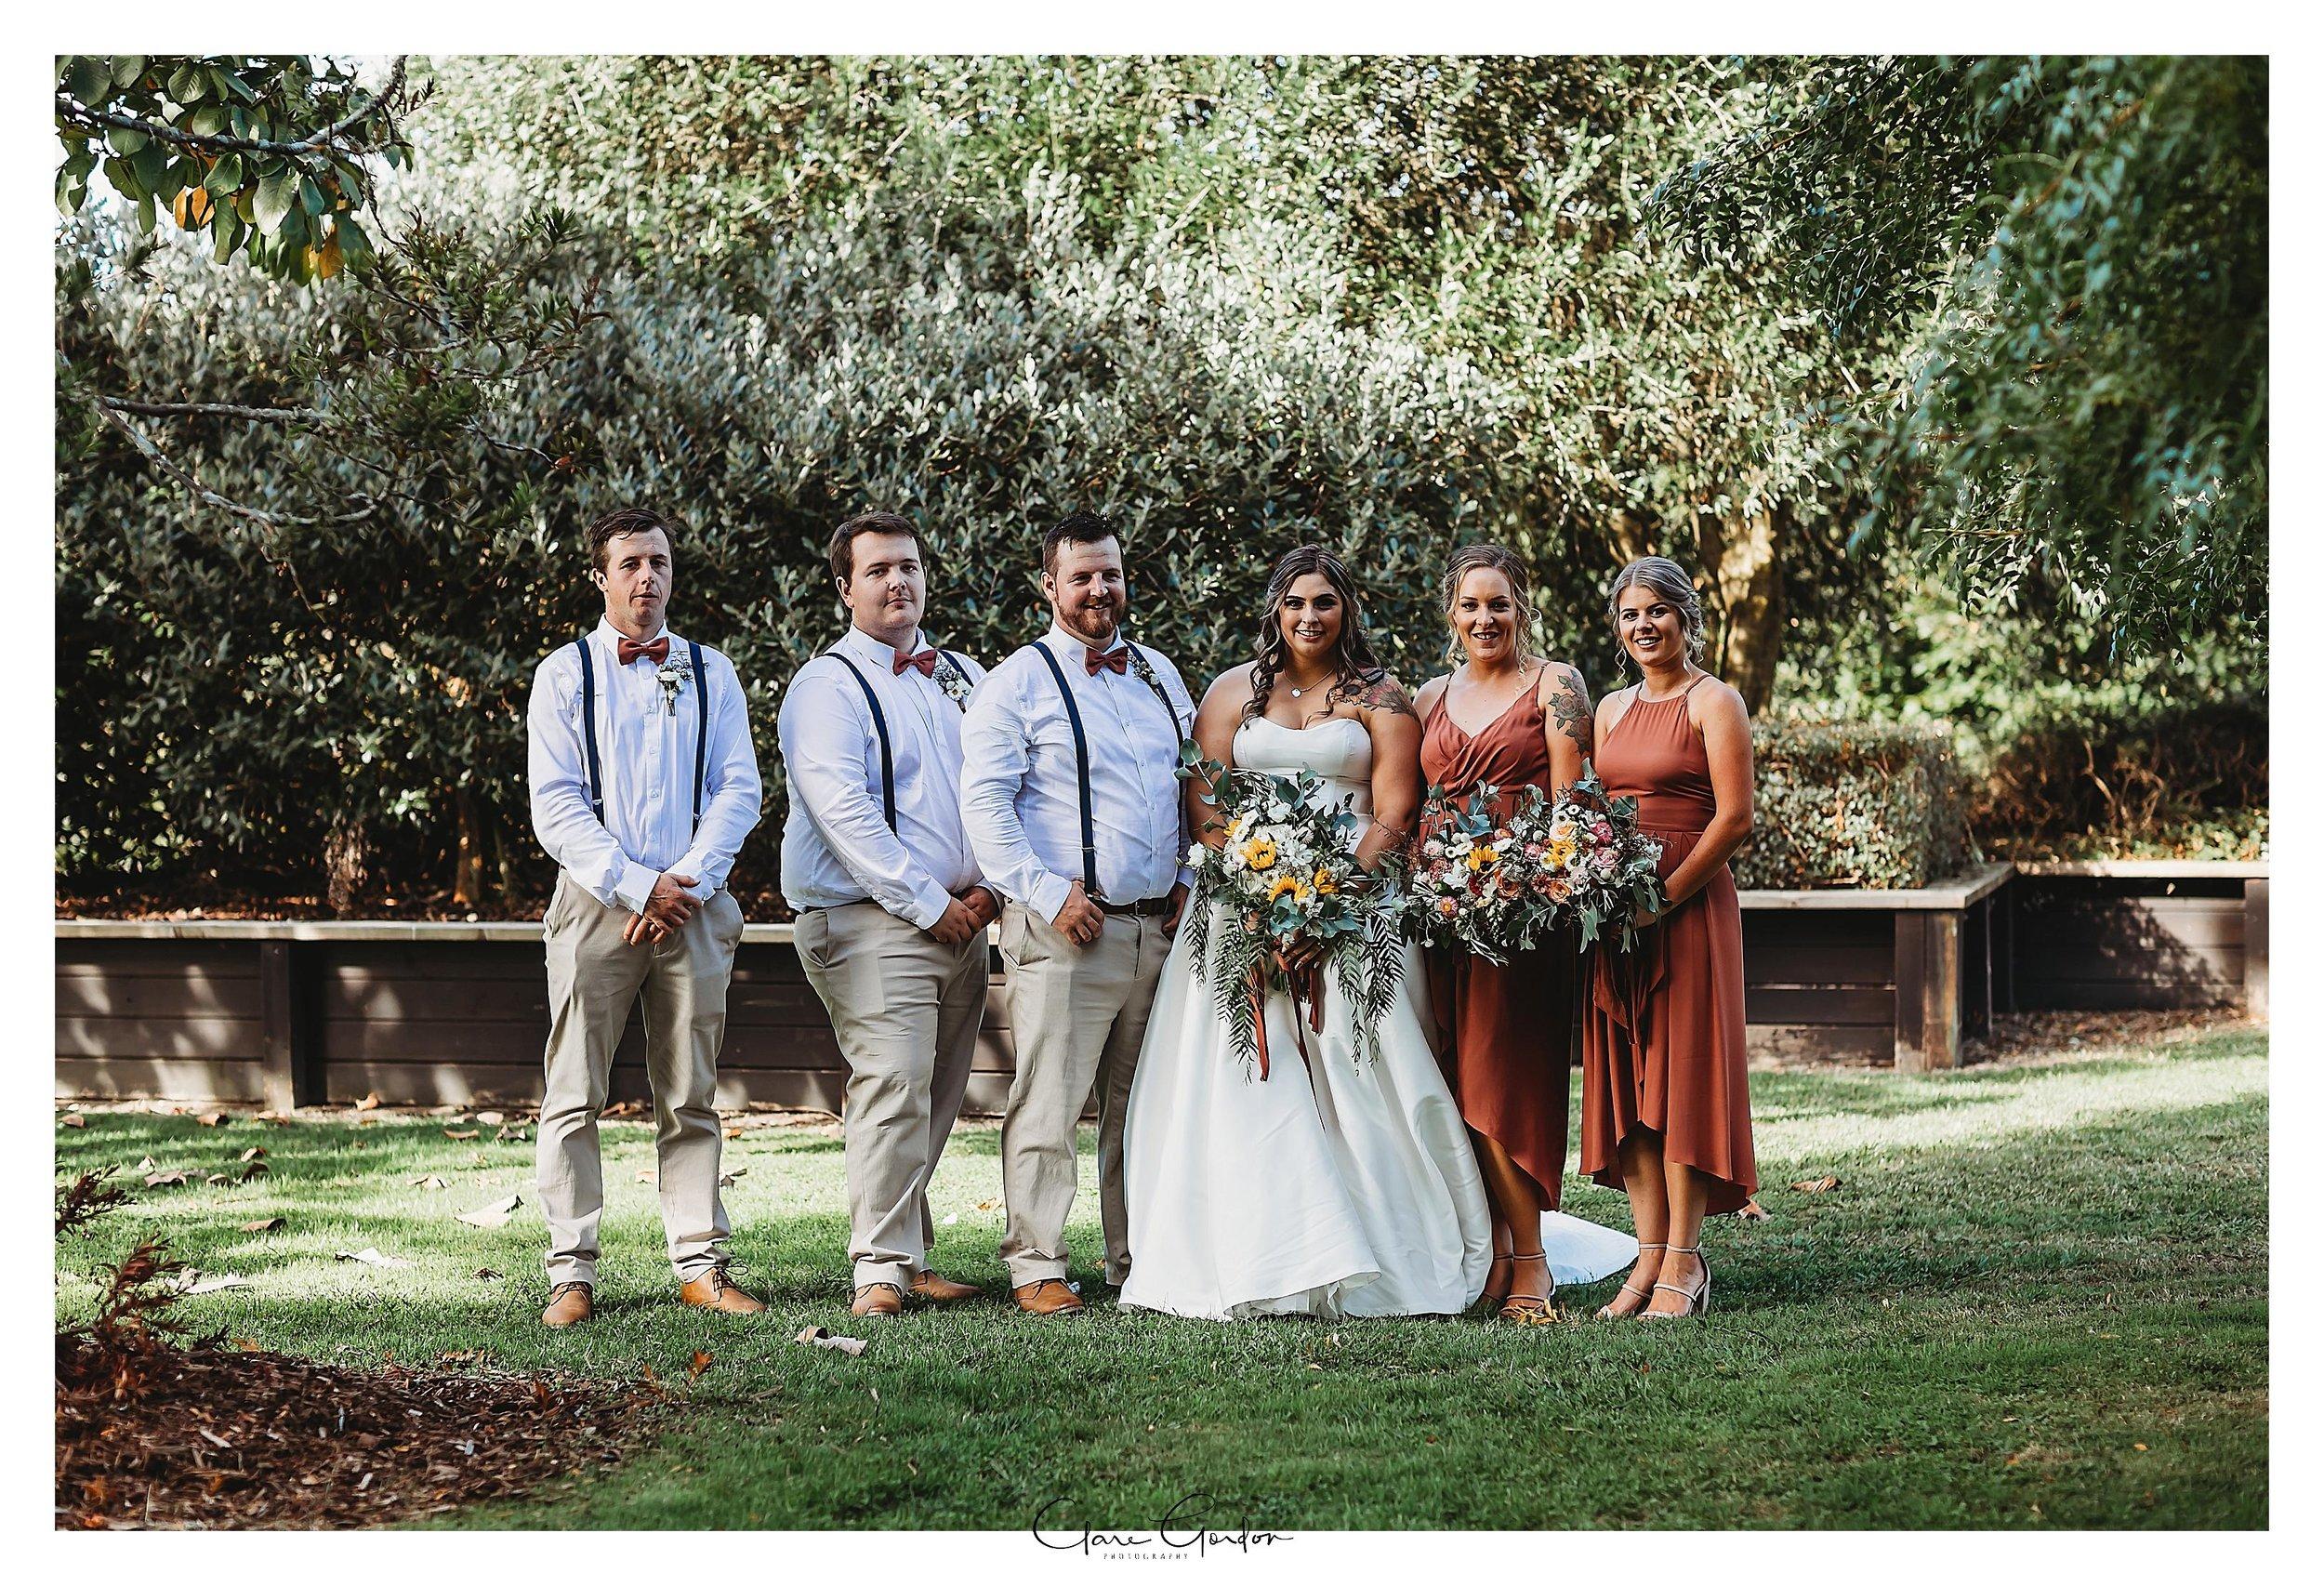 Clare-Gordon-Photography-Bridal-party-photo